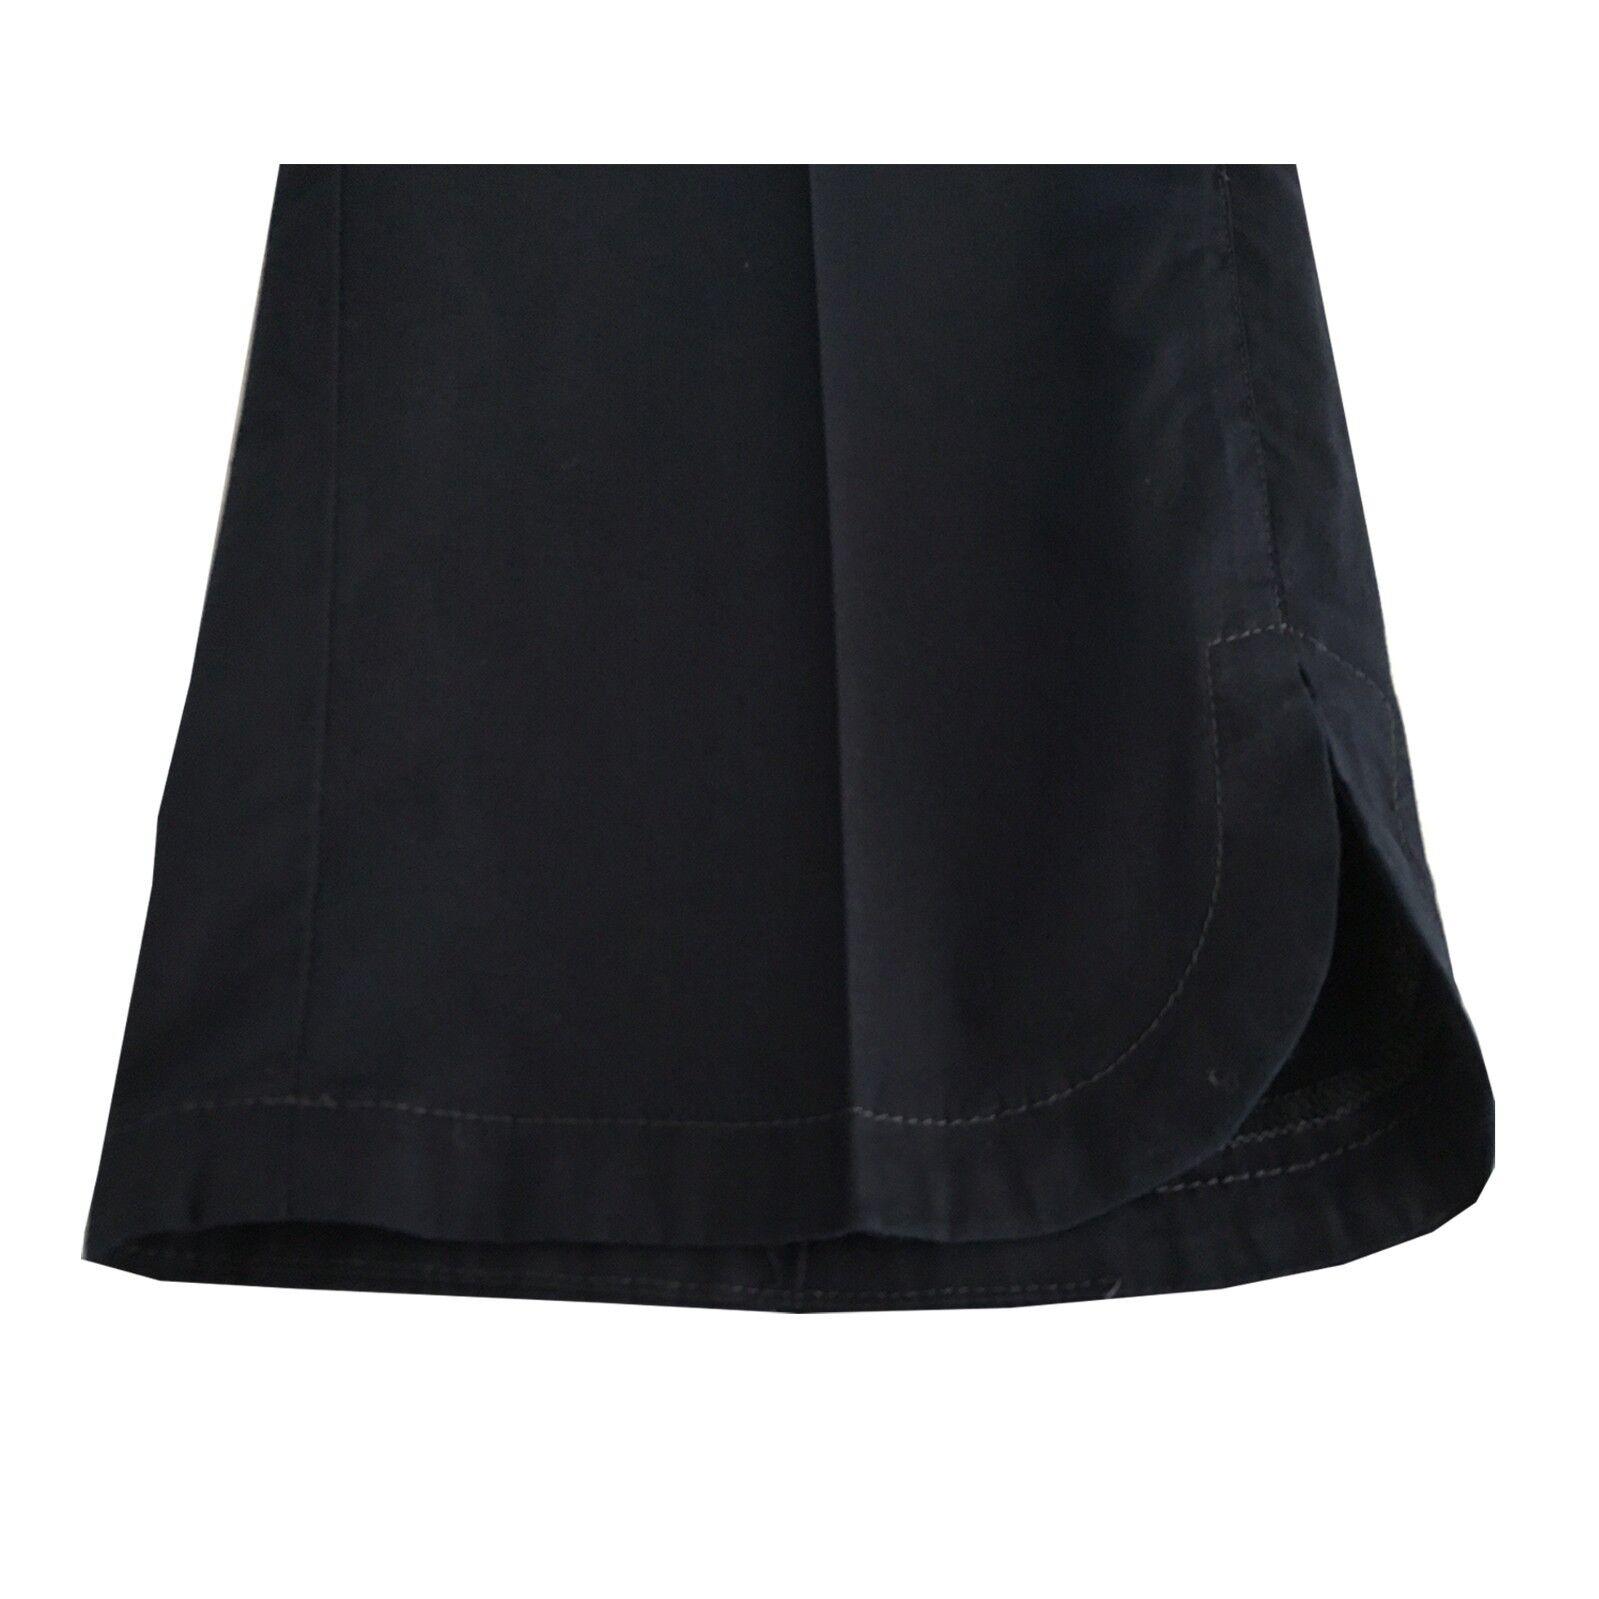 ELENA MIRÒ pantalone donna blu con spacco lunghezza lunghezza lunghezza cm 90 97% cotone 3% elastan cbff5b